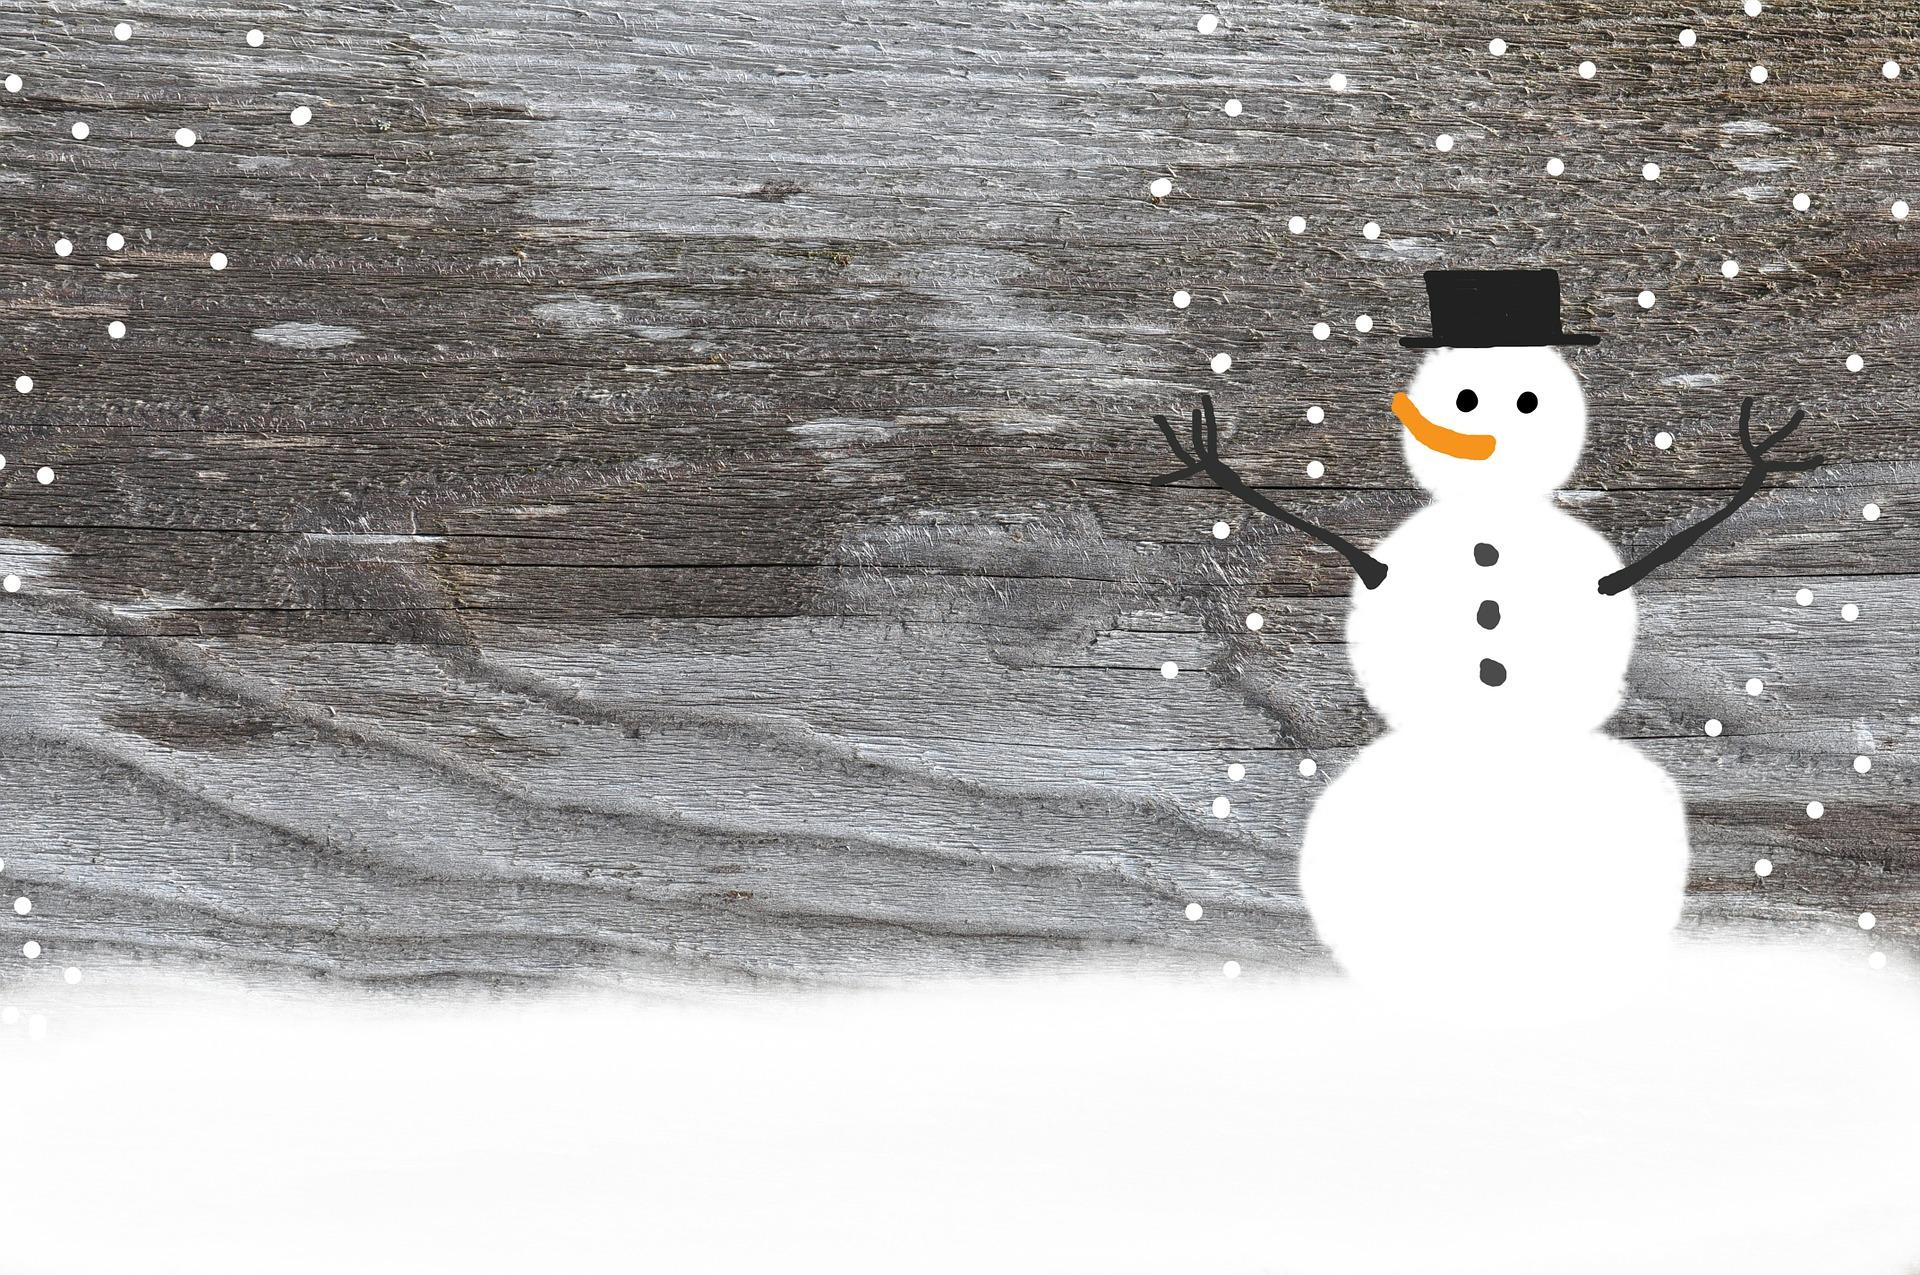 Snow, Art, Artist, Paint, Painting, HQ Photo